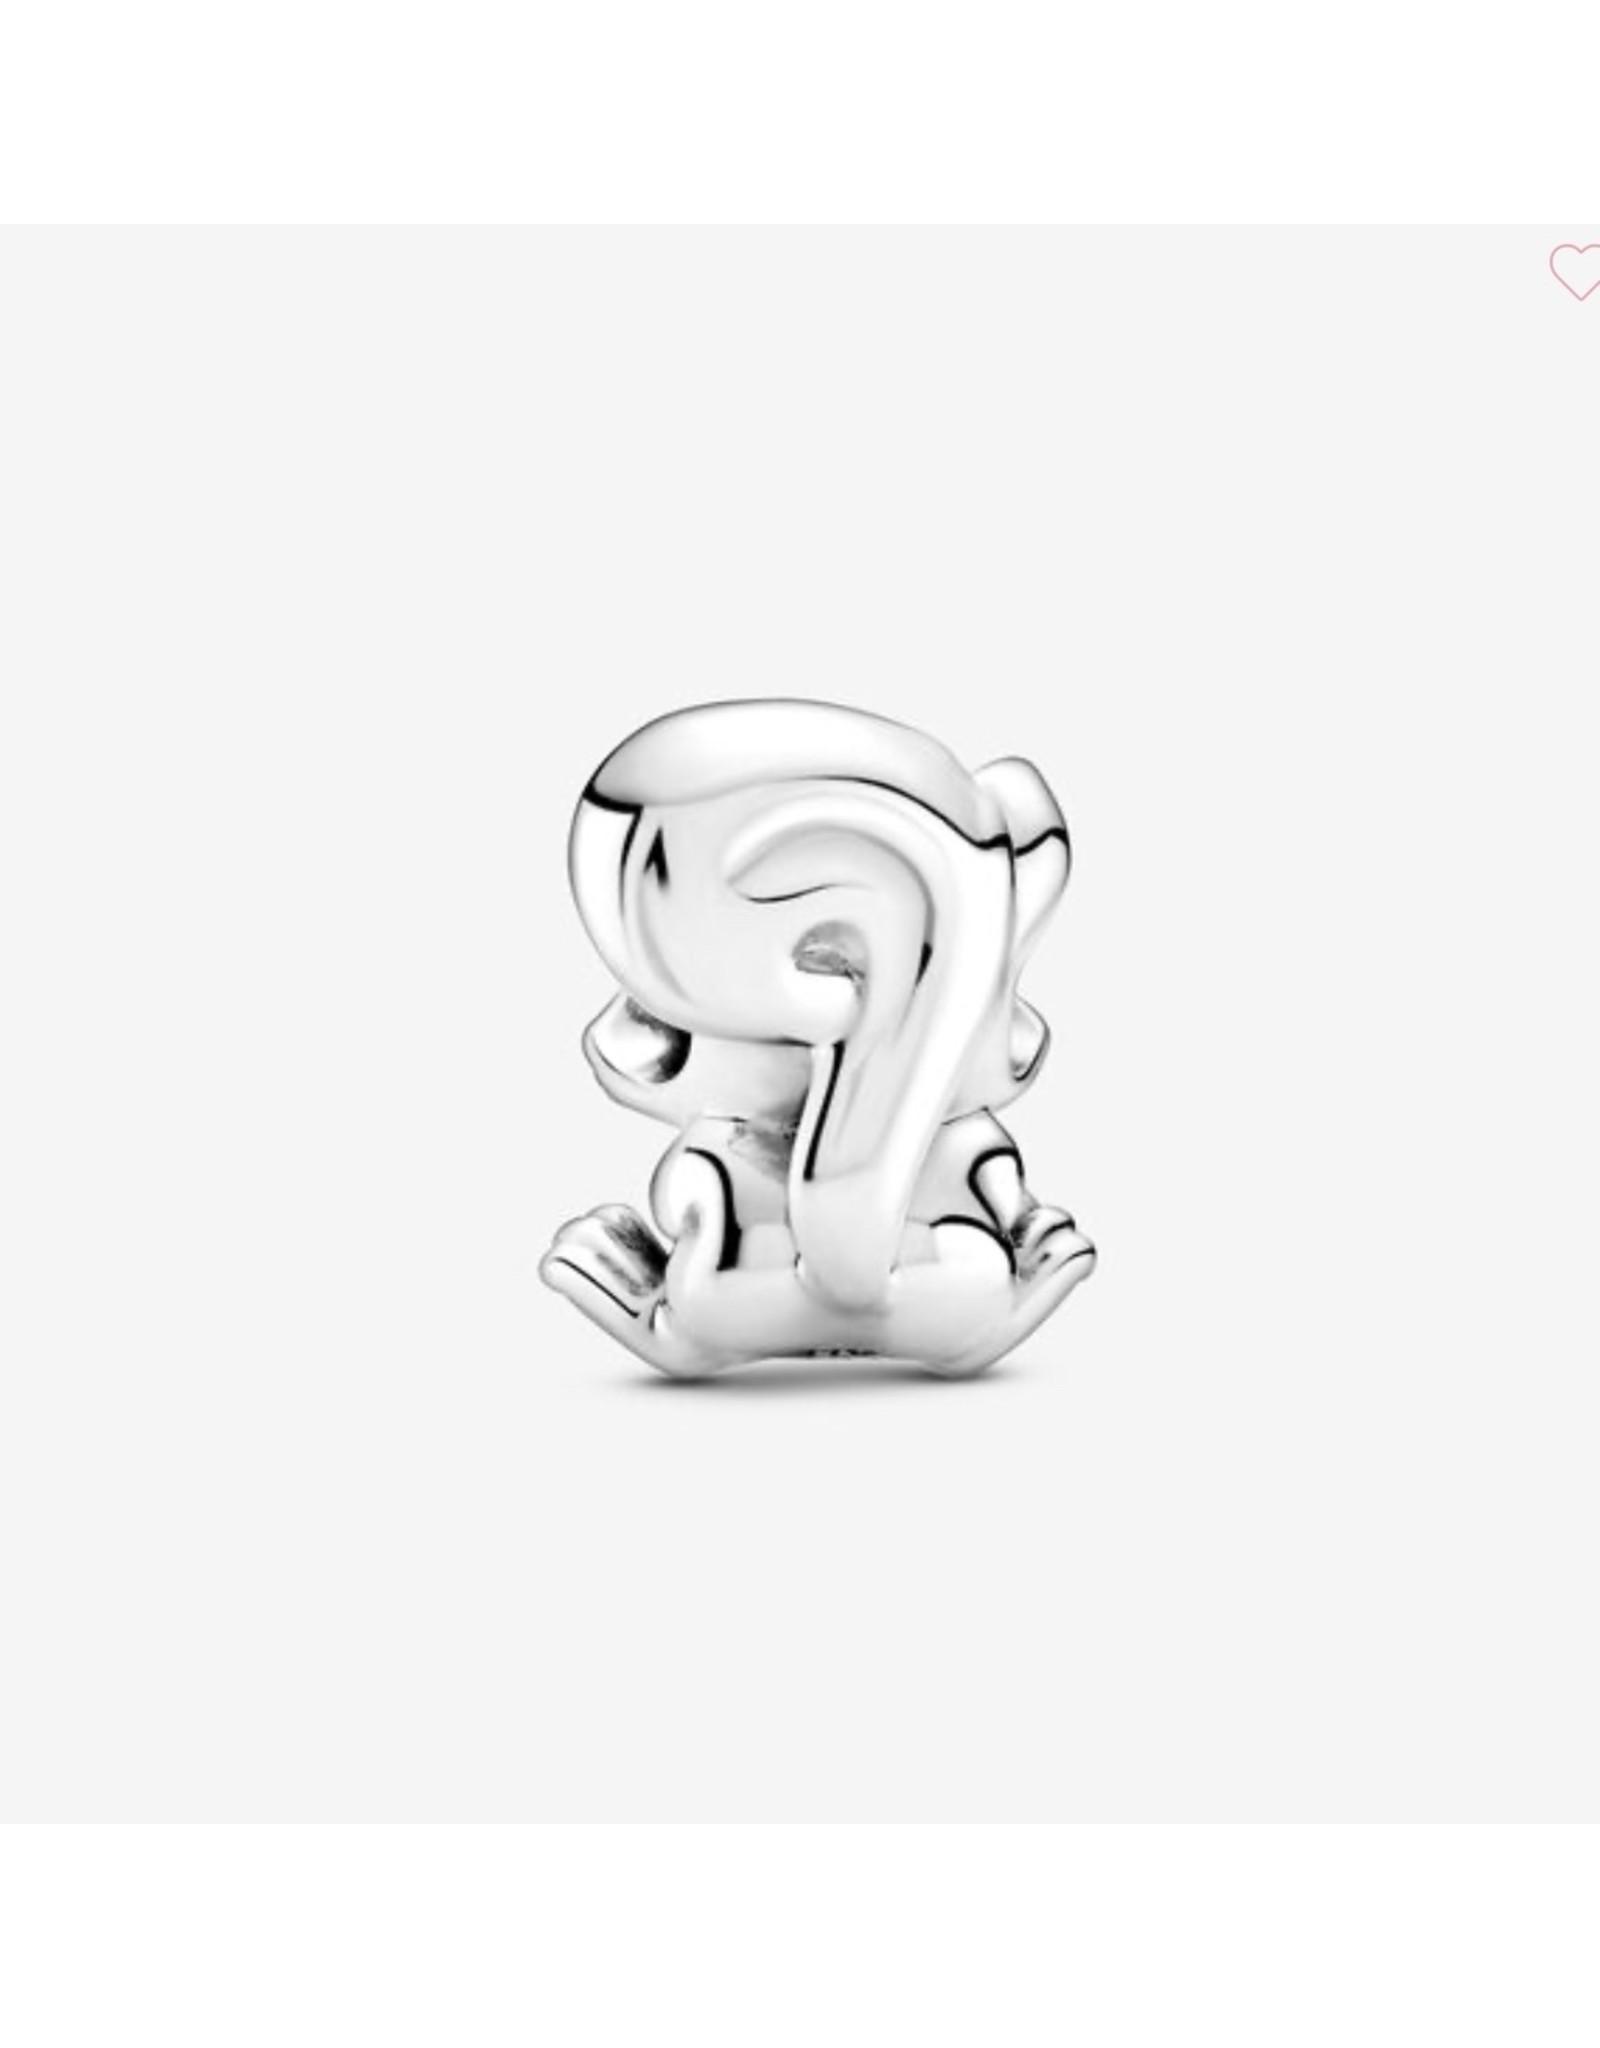 Pandora Pandora Charm,799105C01, Cute Squirrel, Sterling Silver,Black Enamel